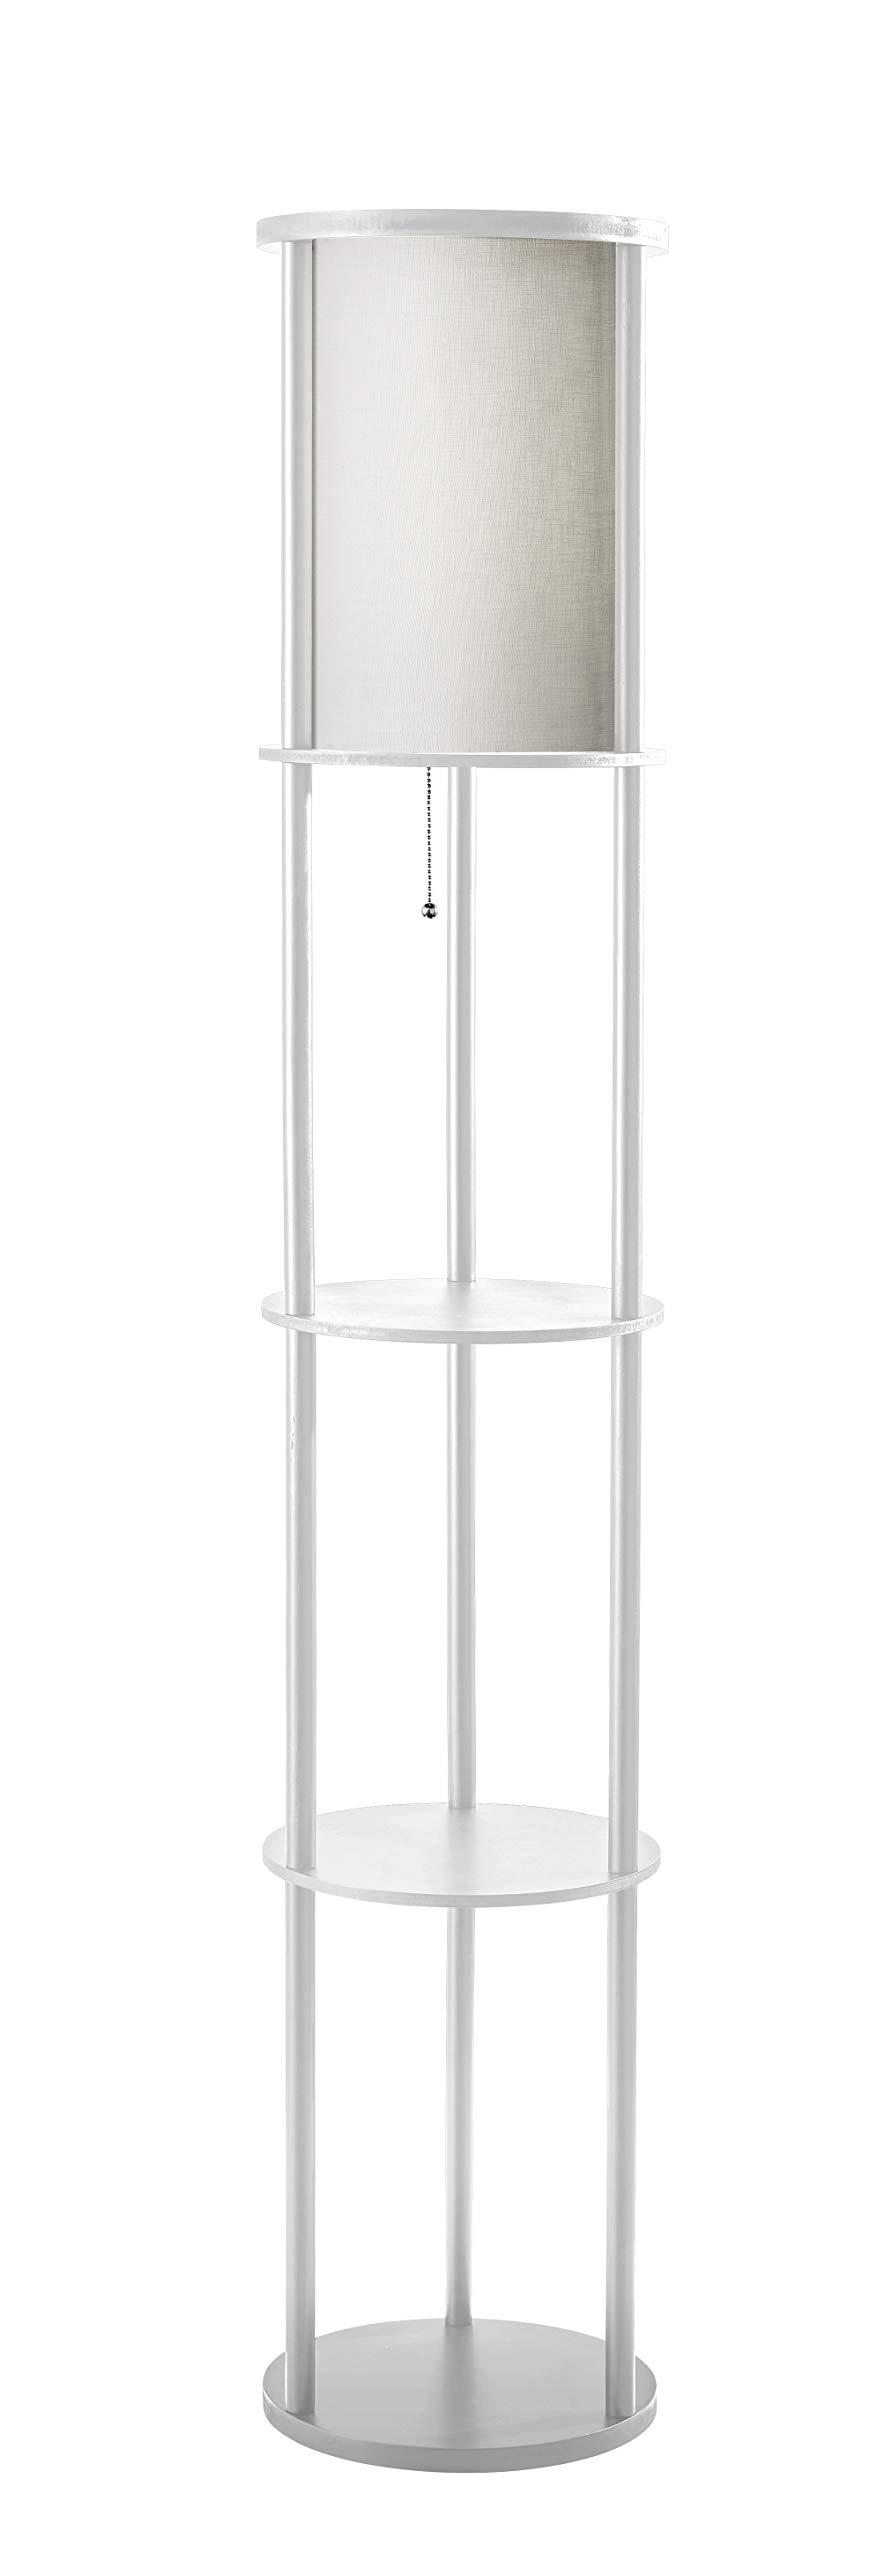 Adesso 3117-02 Stewart Round Shelf Floor Lamp, White Base Finish